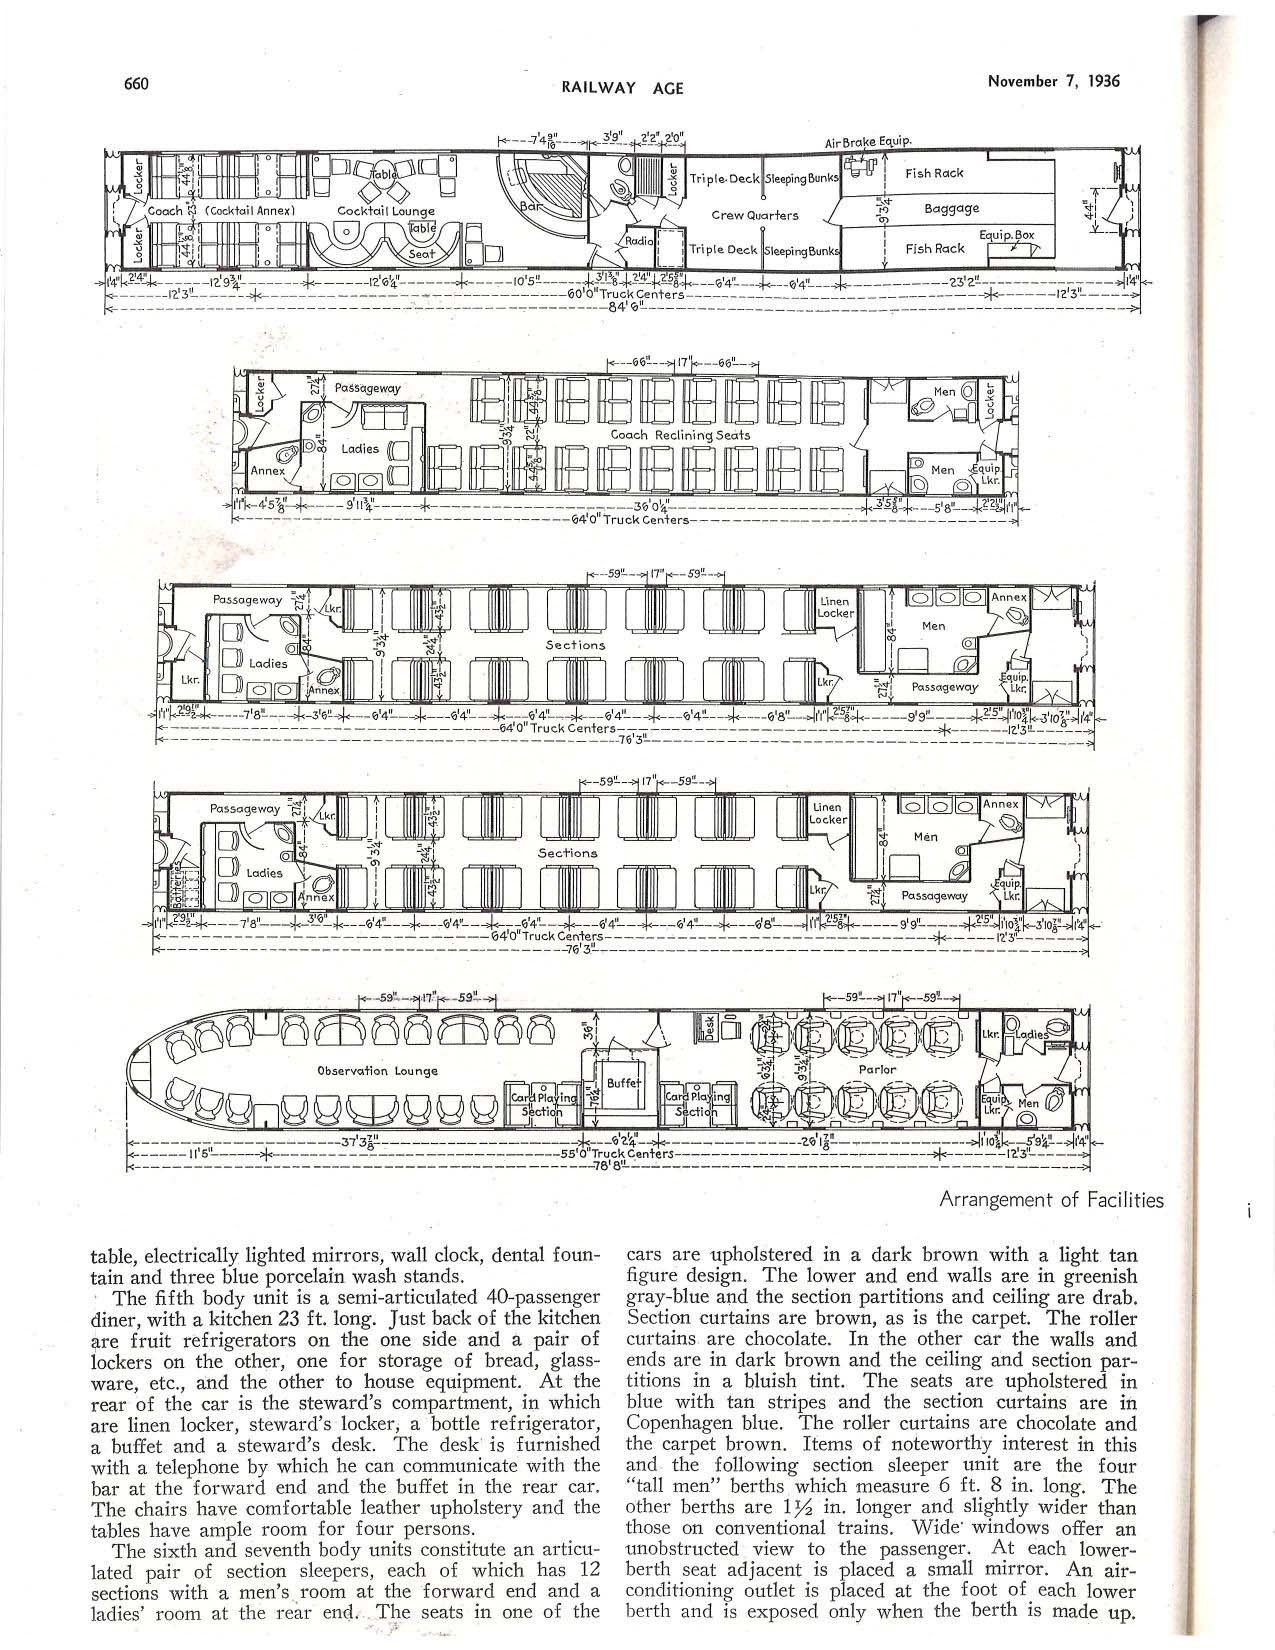 1936+Railway+Age+Article+-+Compressed 3.jpg